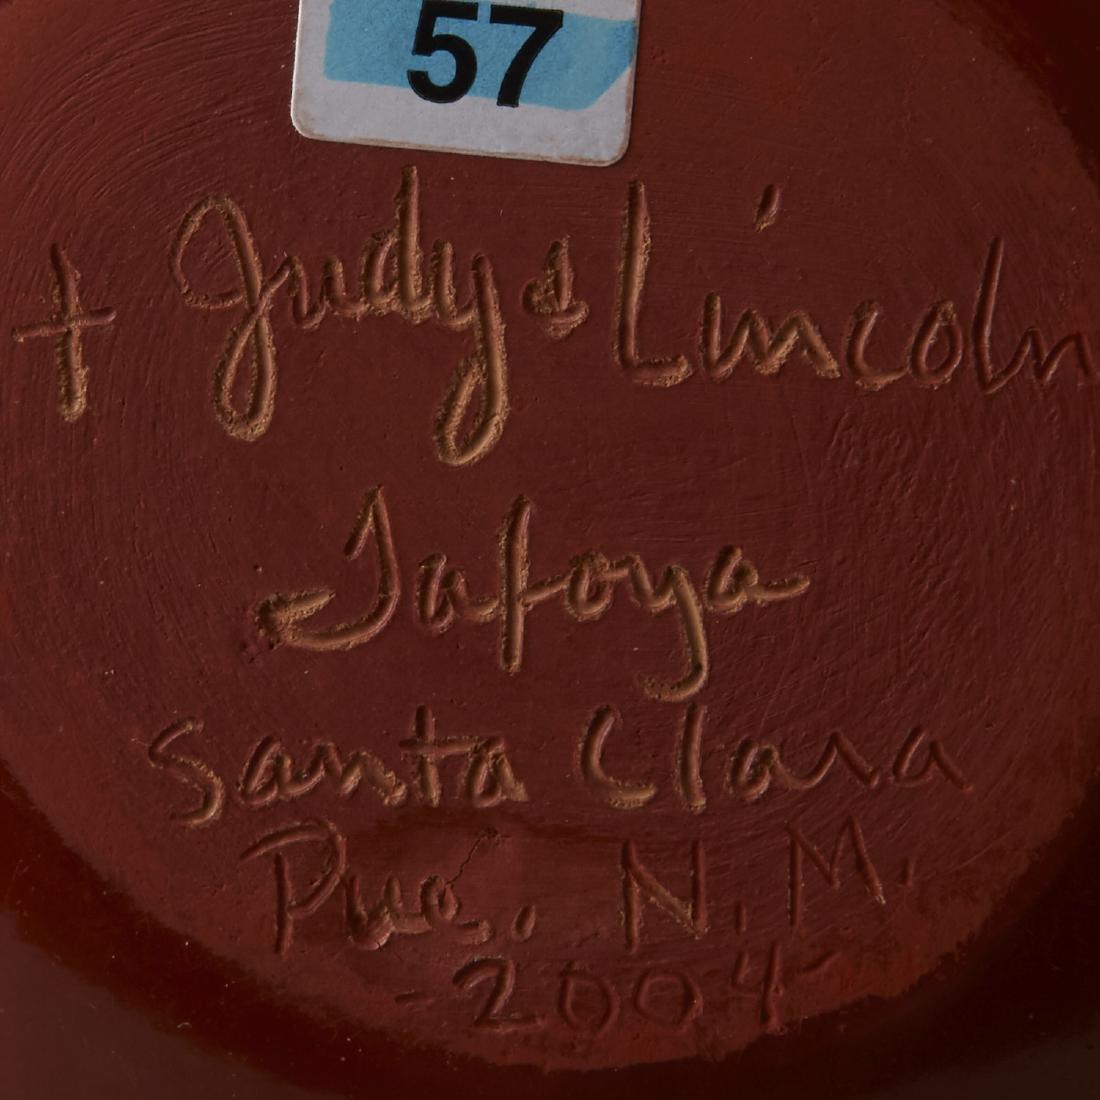 5 Santa Clara Redware Jars Tafoya, Gachapin - 8